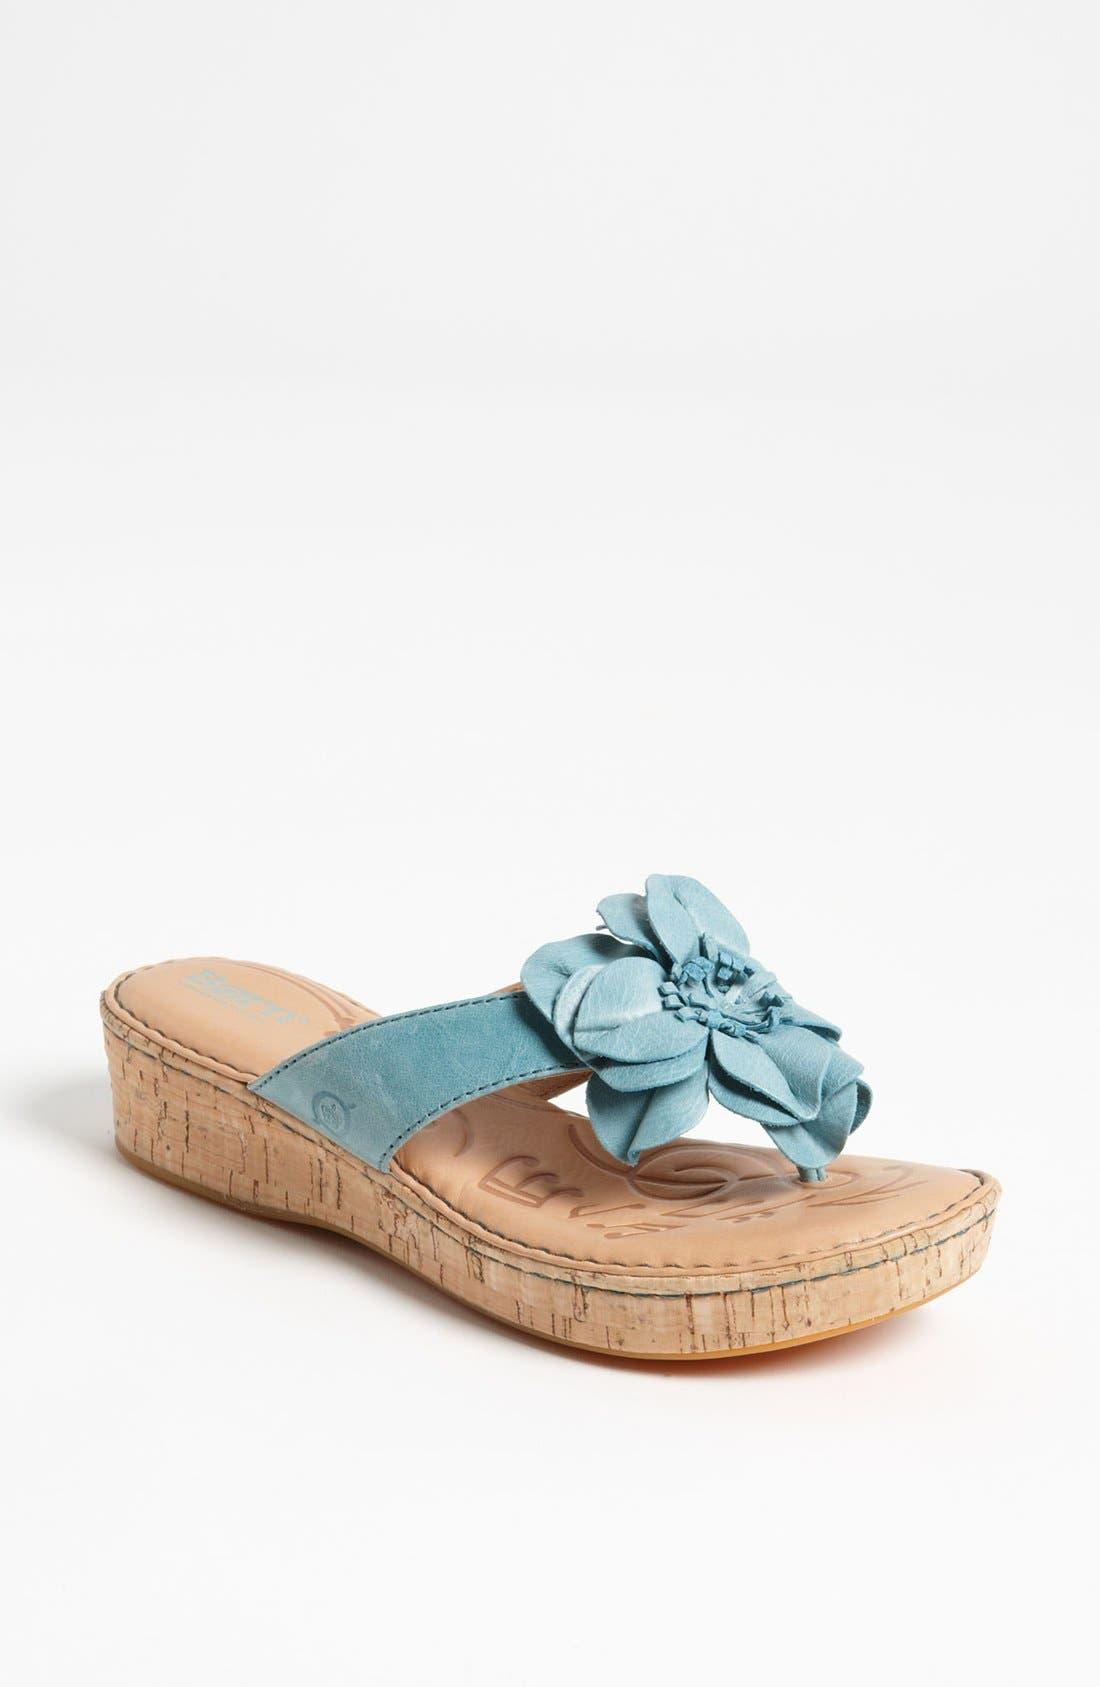 Alternate Image 1 Selected - Børn 'Alexie' Sandal